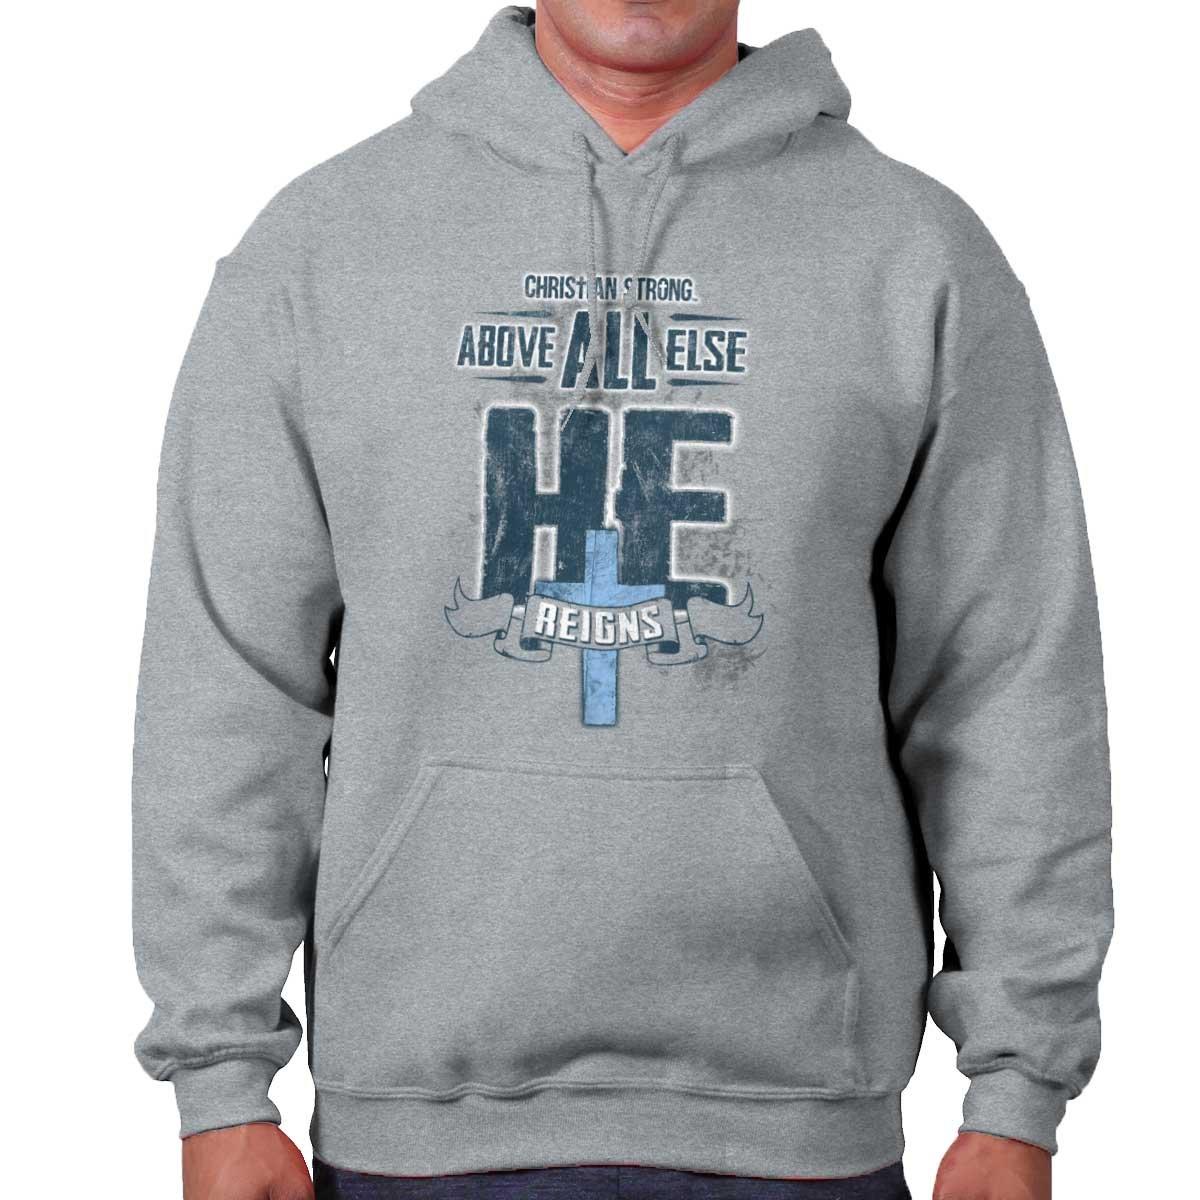 Above All Else Love Christian Shirt | Jesus Christ Faith Hope Hoodie Sweatshirt